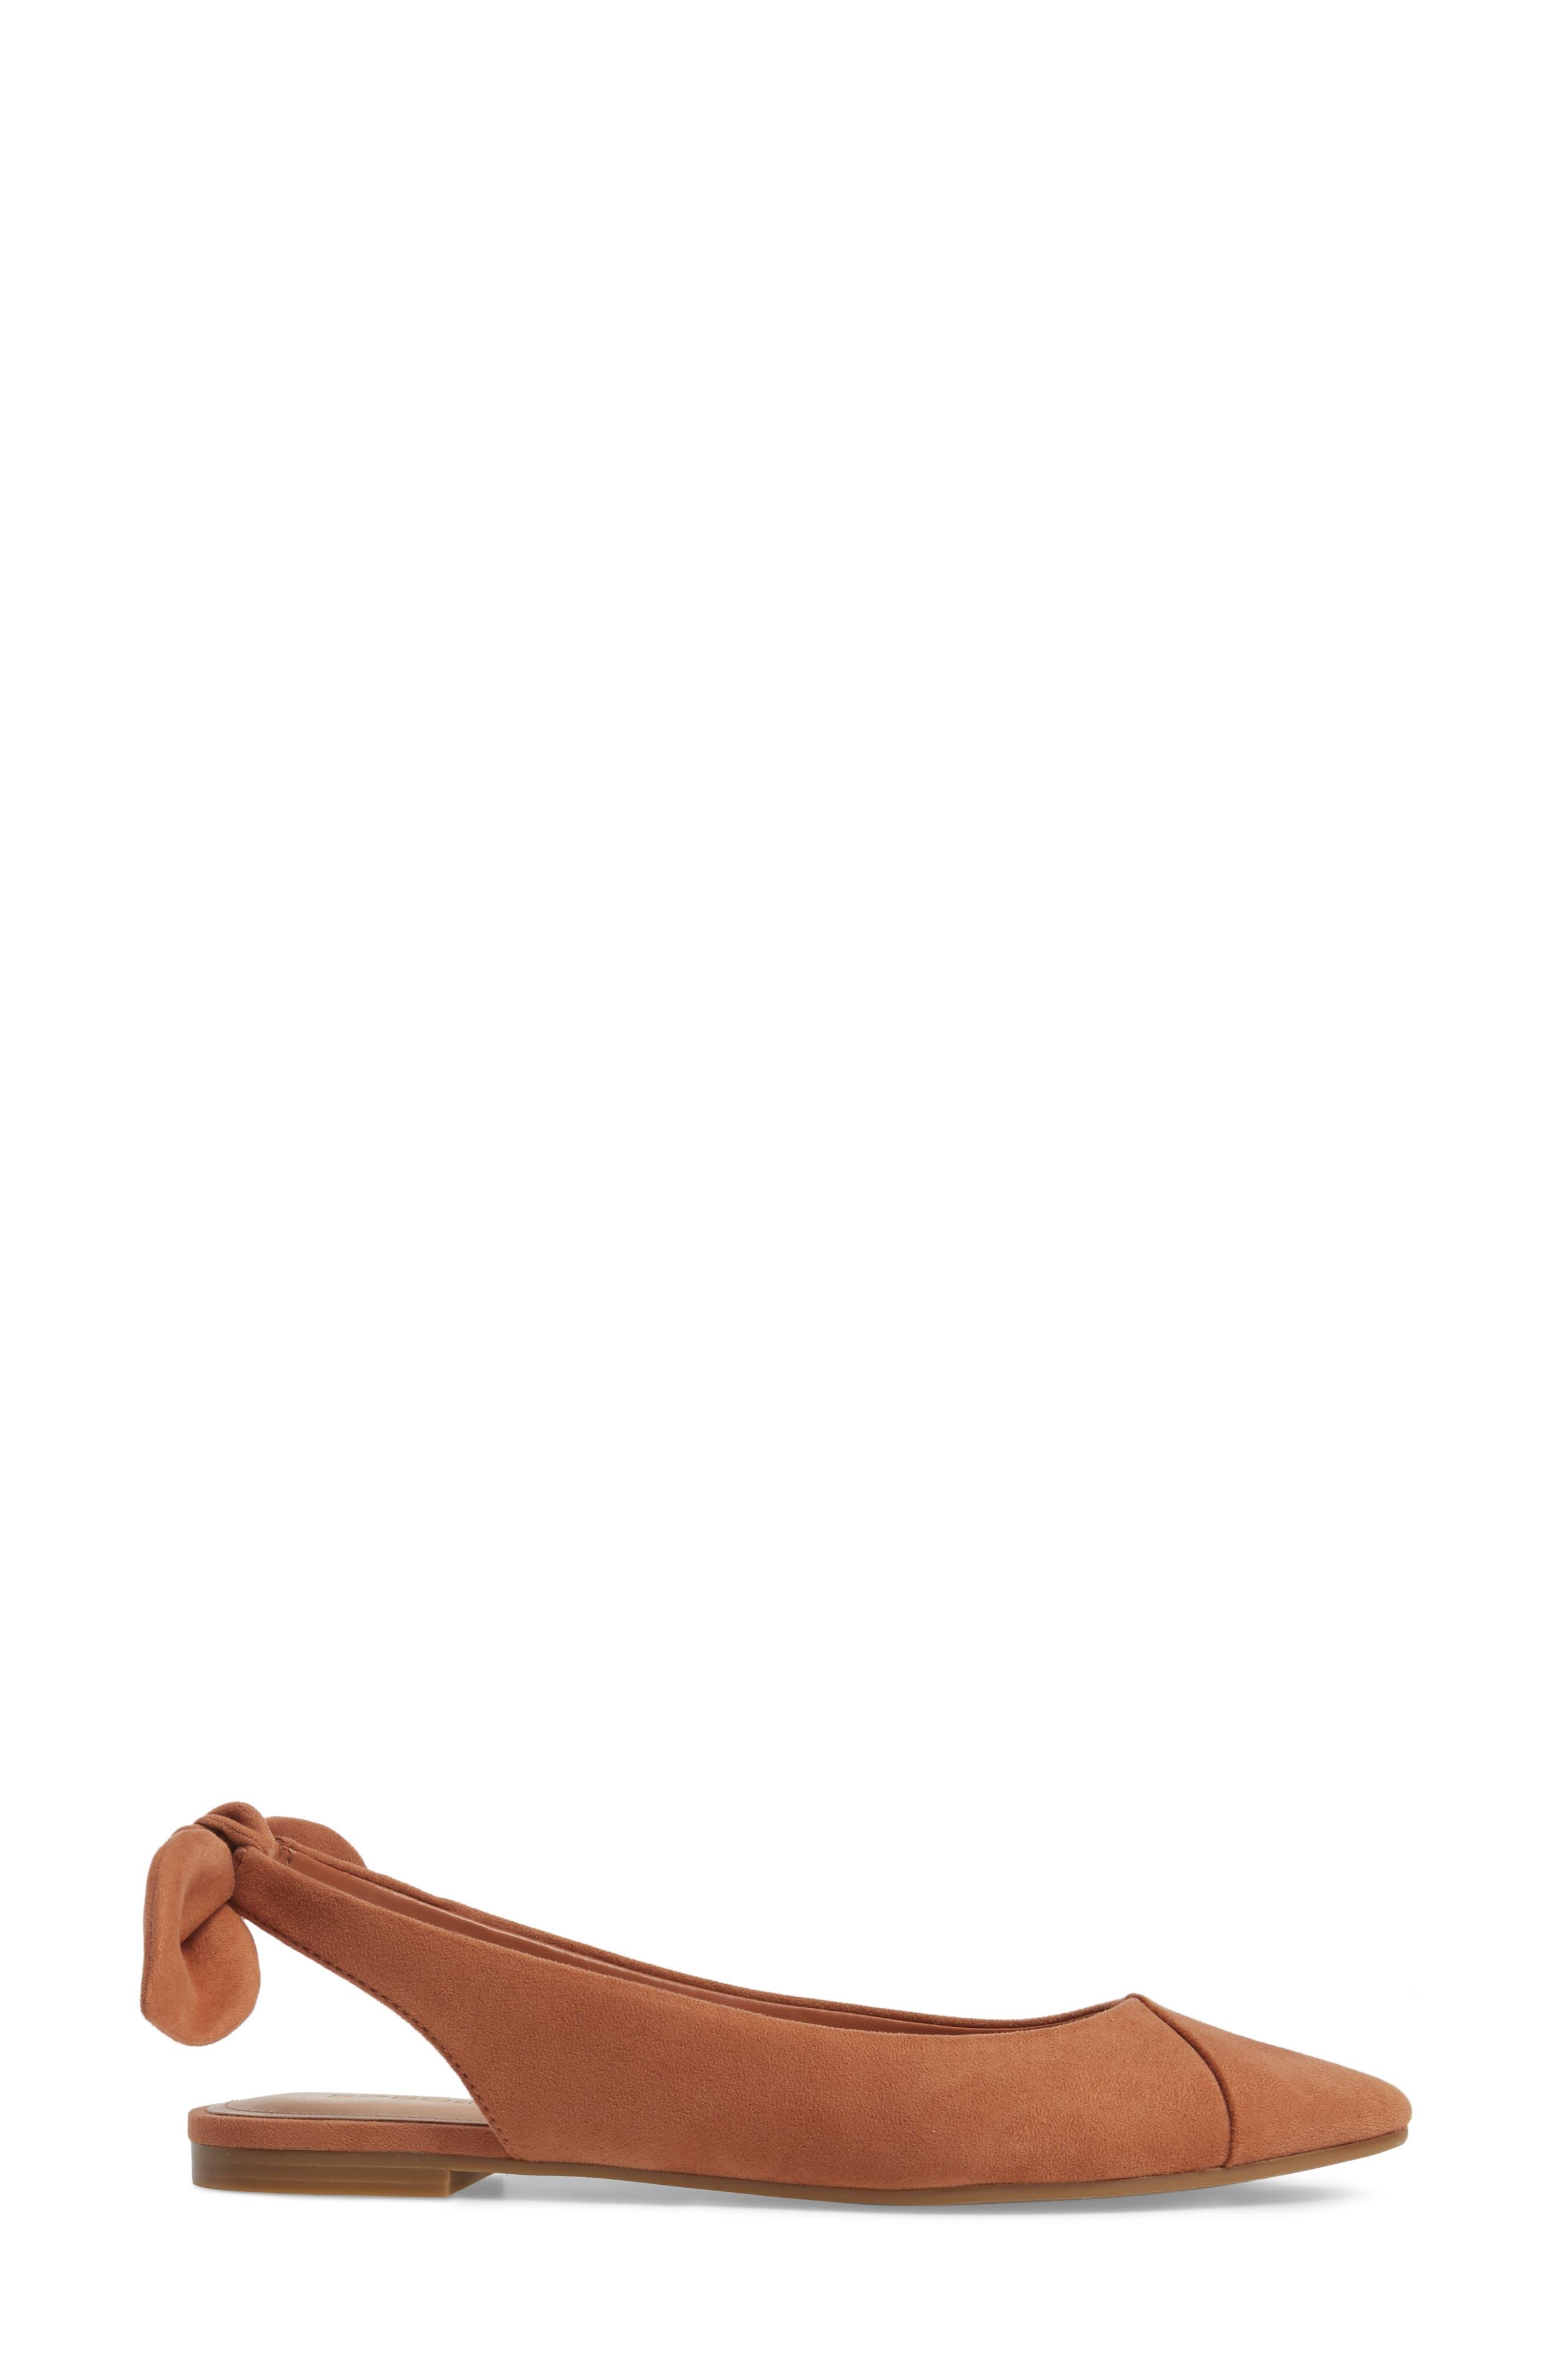 Alternate Image 3  - BCBG Mara Bow Pointy Toe Flat (Women)